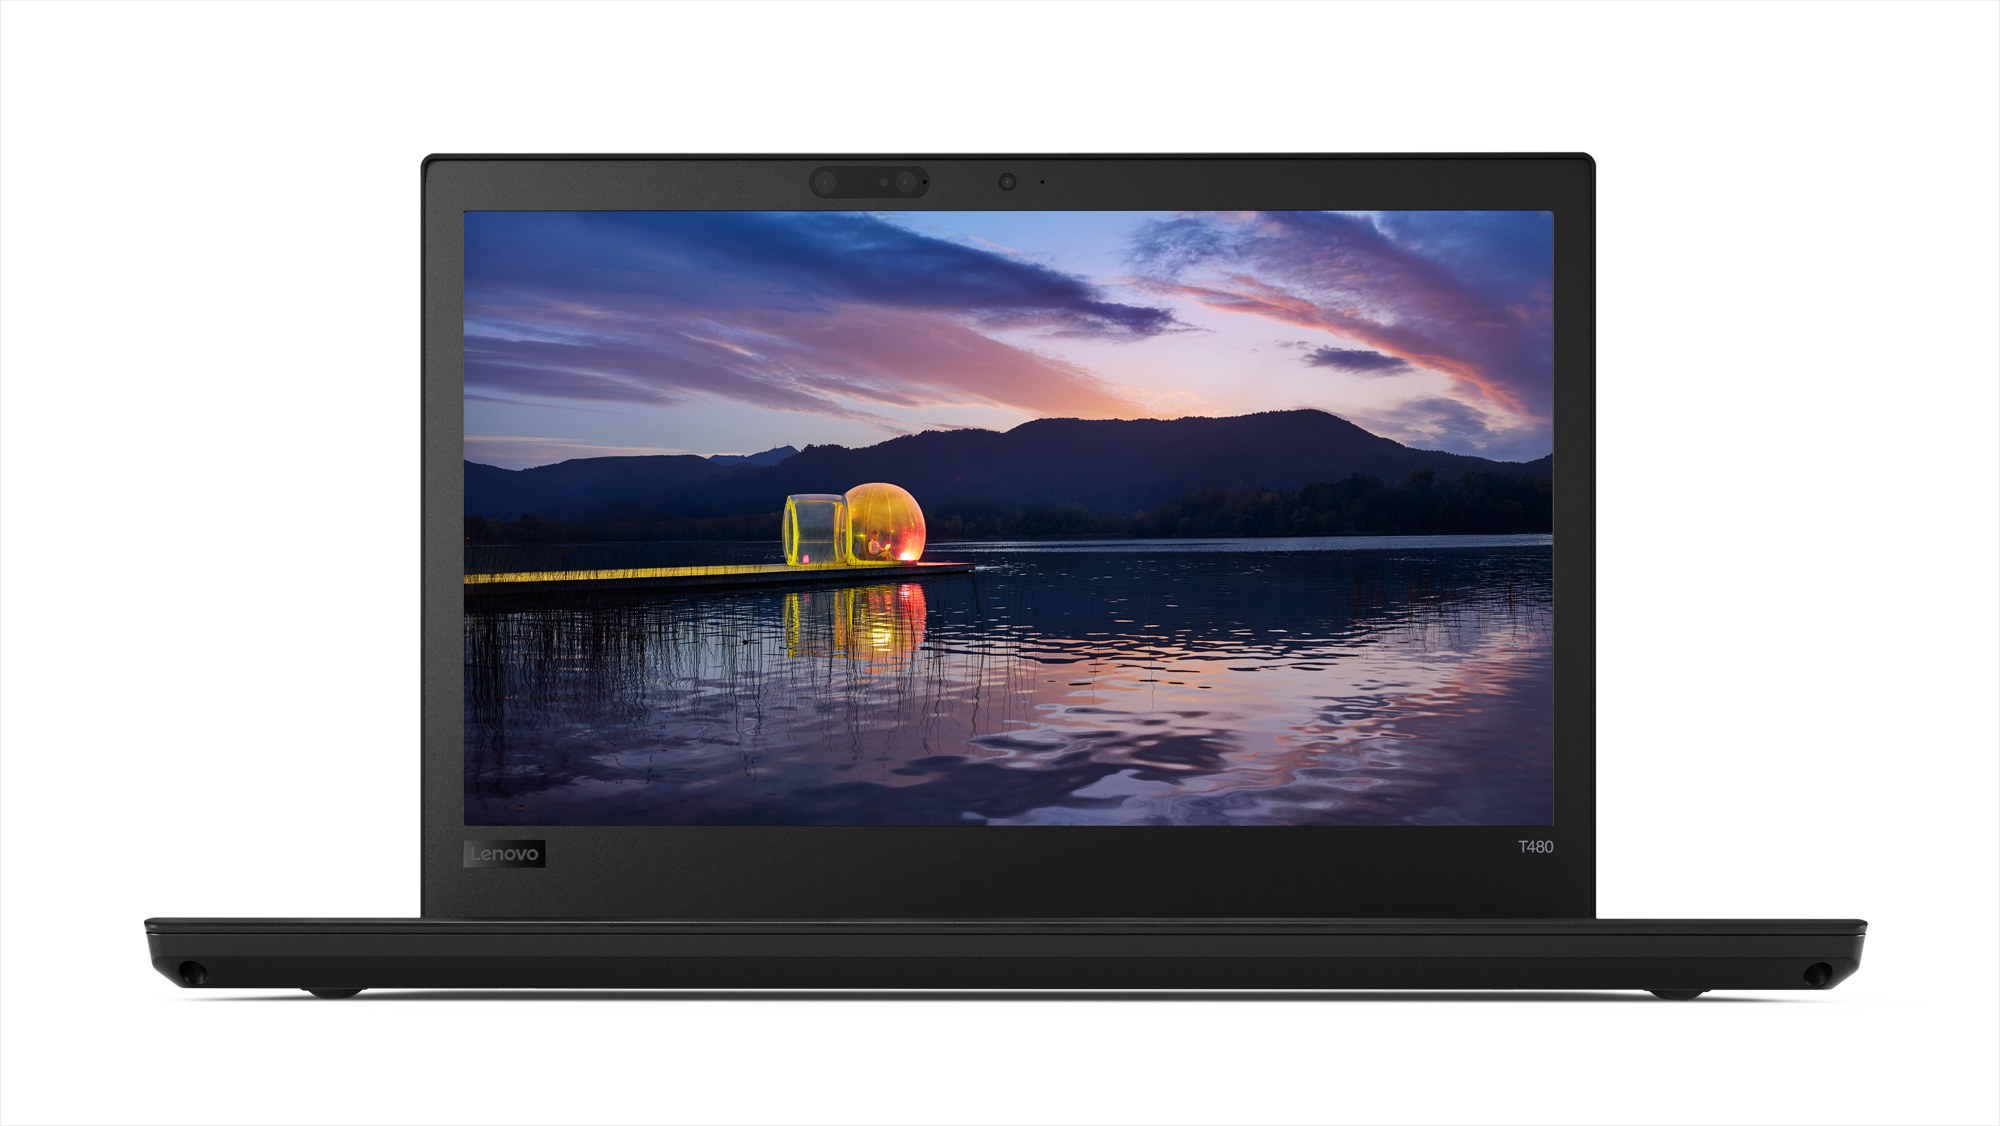 2018 LENOVO ThinkPad T480 20L5-CTO1WW Quad Core i5-8350U/16G